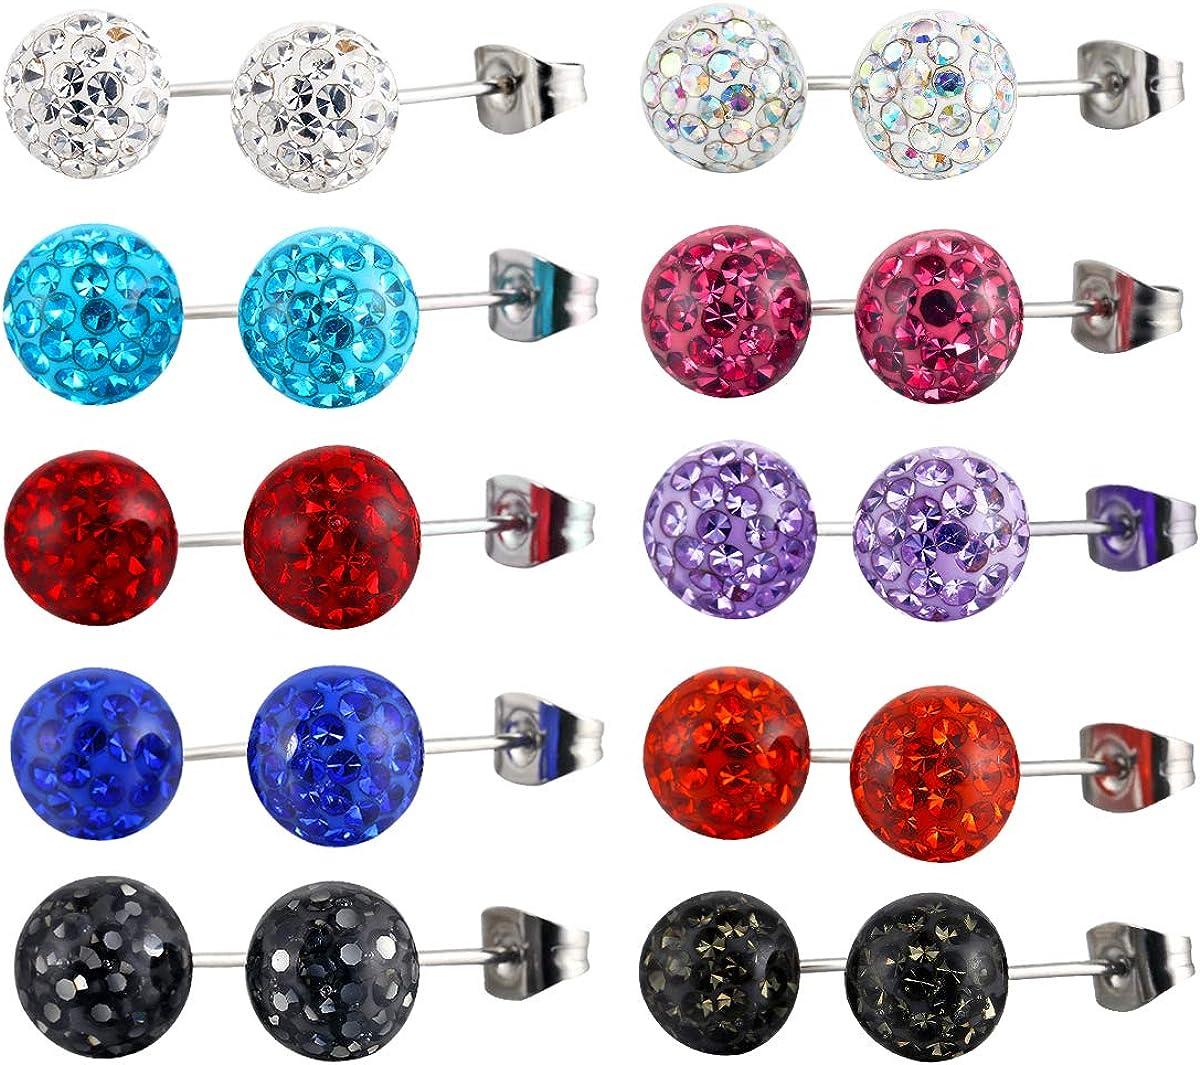 Kaiyu 10 Pair Stainless Steel Shamballa Crystal Disco Ball Pave Bead Stud Earring Hypoallergenic